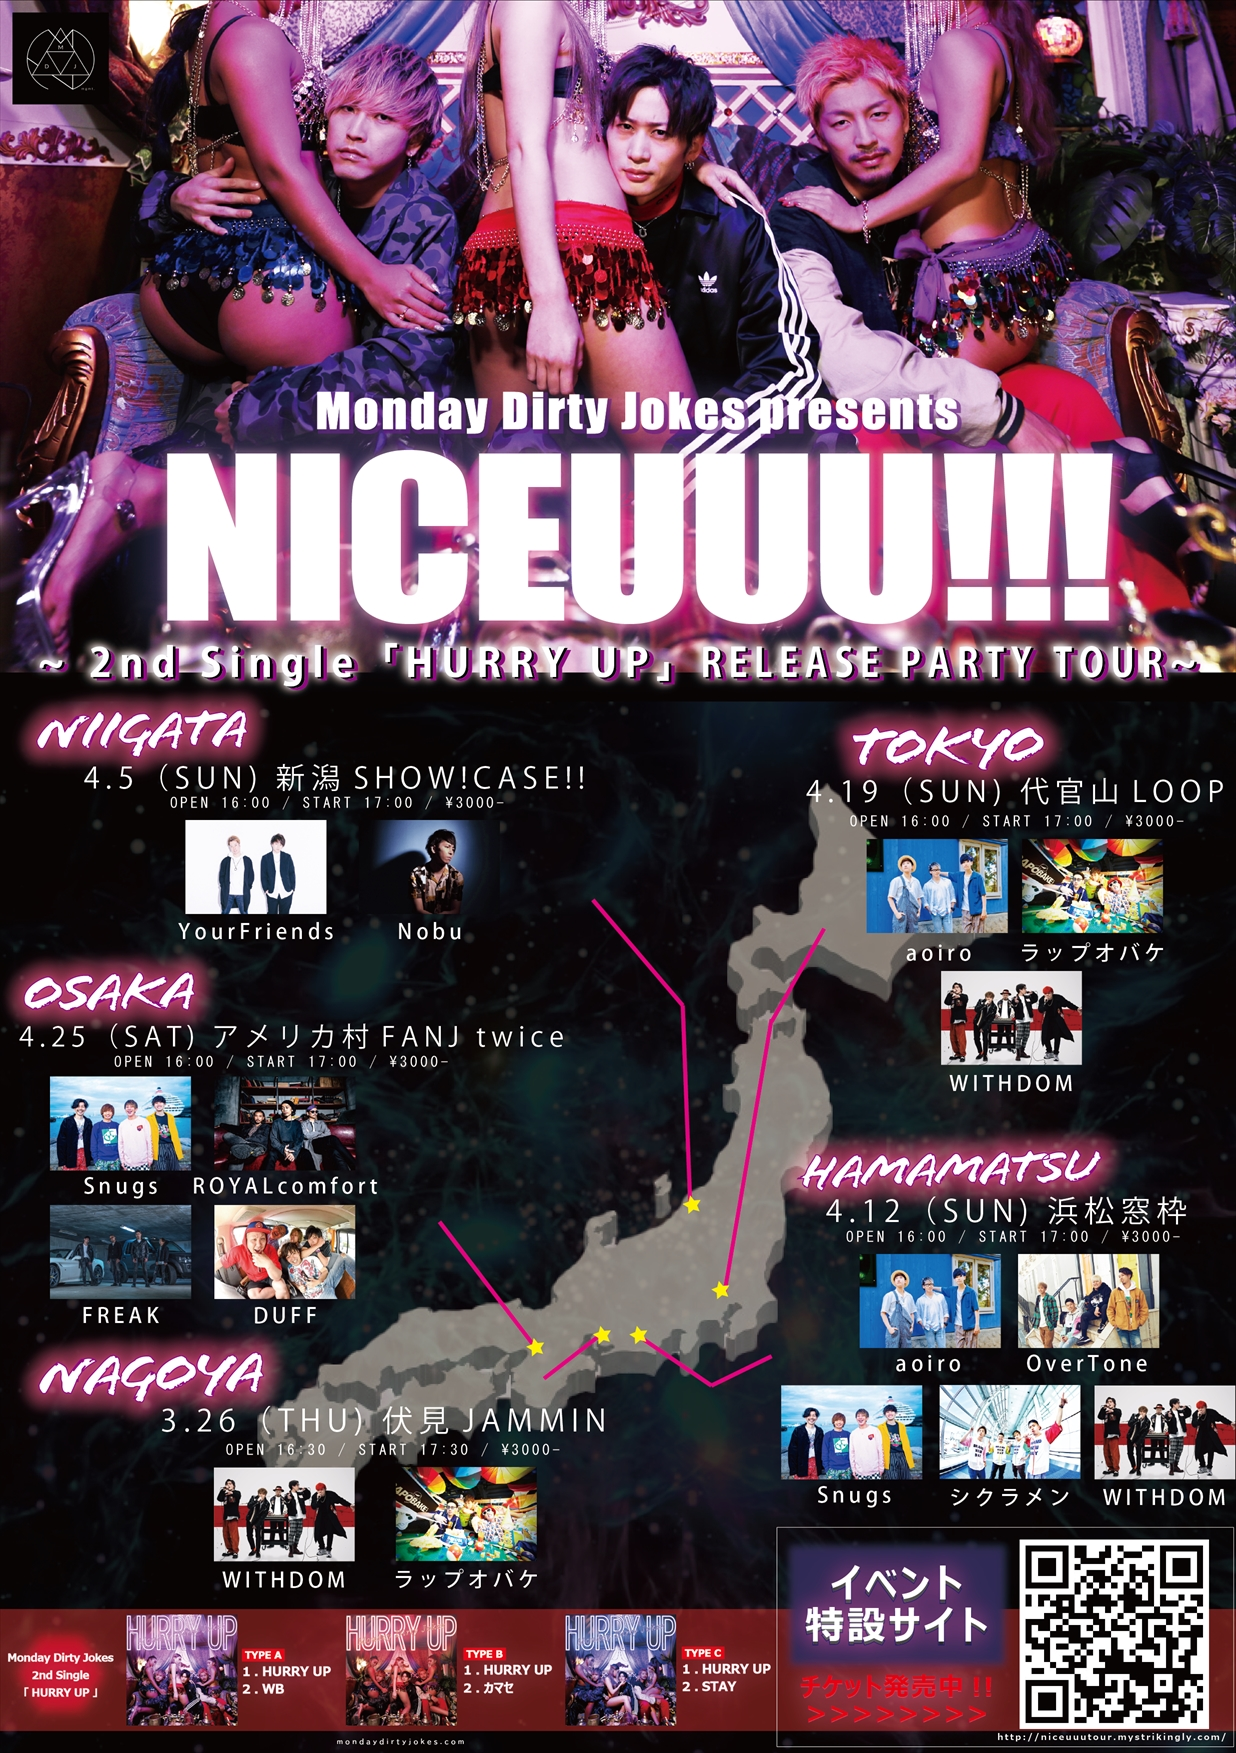 Monday Dirty Jokes 「NICEUUU!!!~HURRY UP RELEASE TOURS~」 @伏見JAMMIN